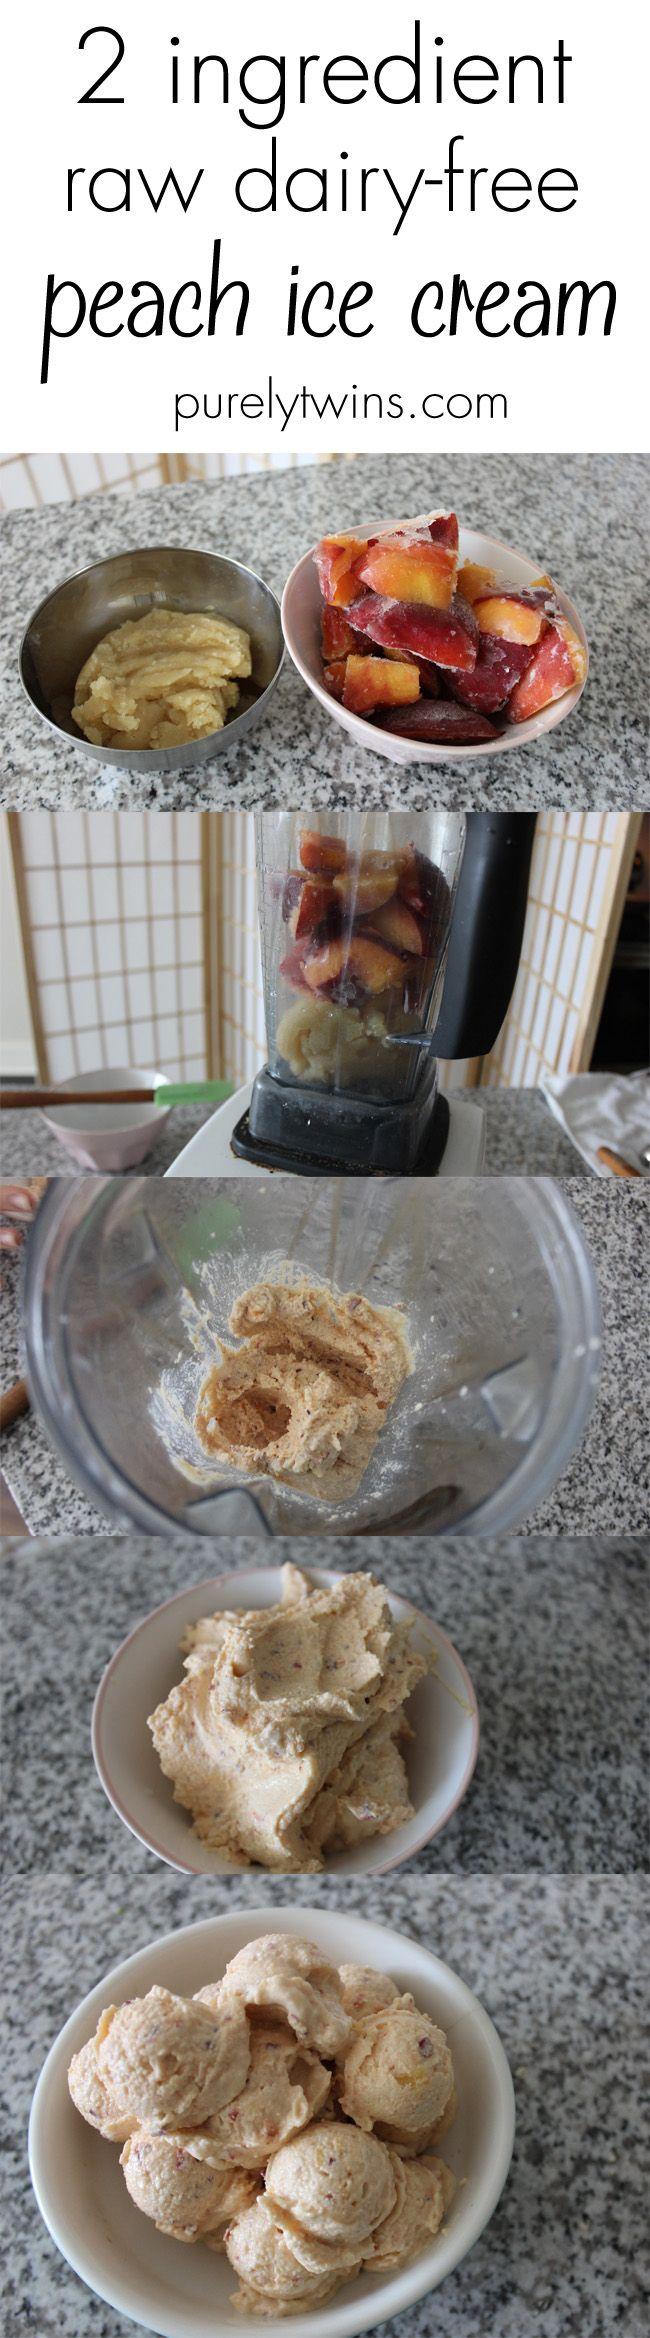 2 ingredient raw dairy-free peach ice cream purelytwins without icecream maker